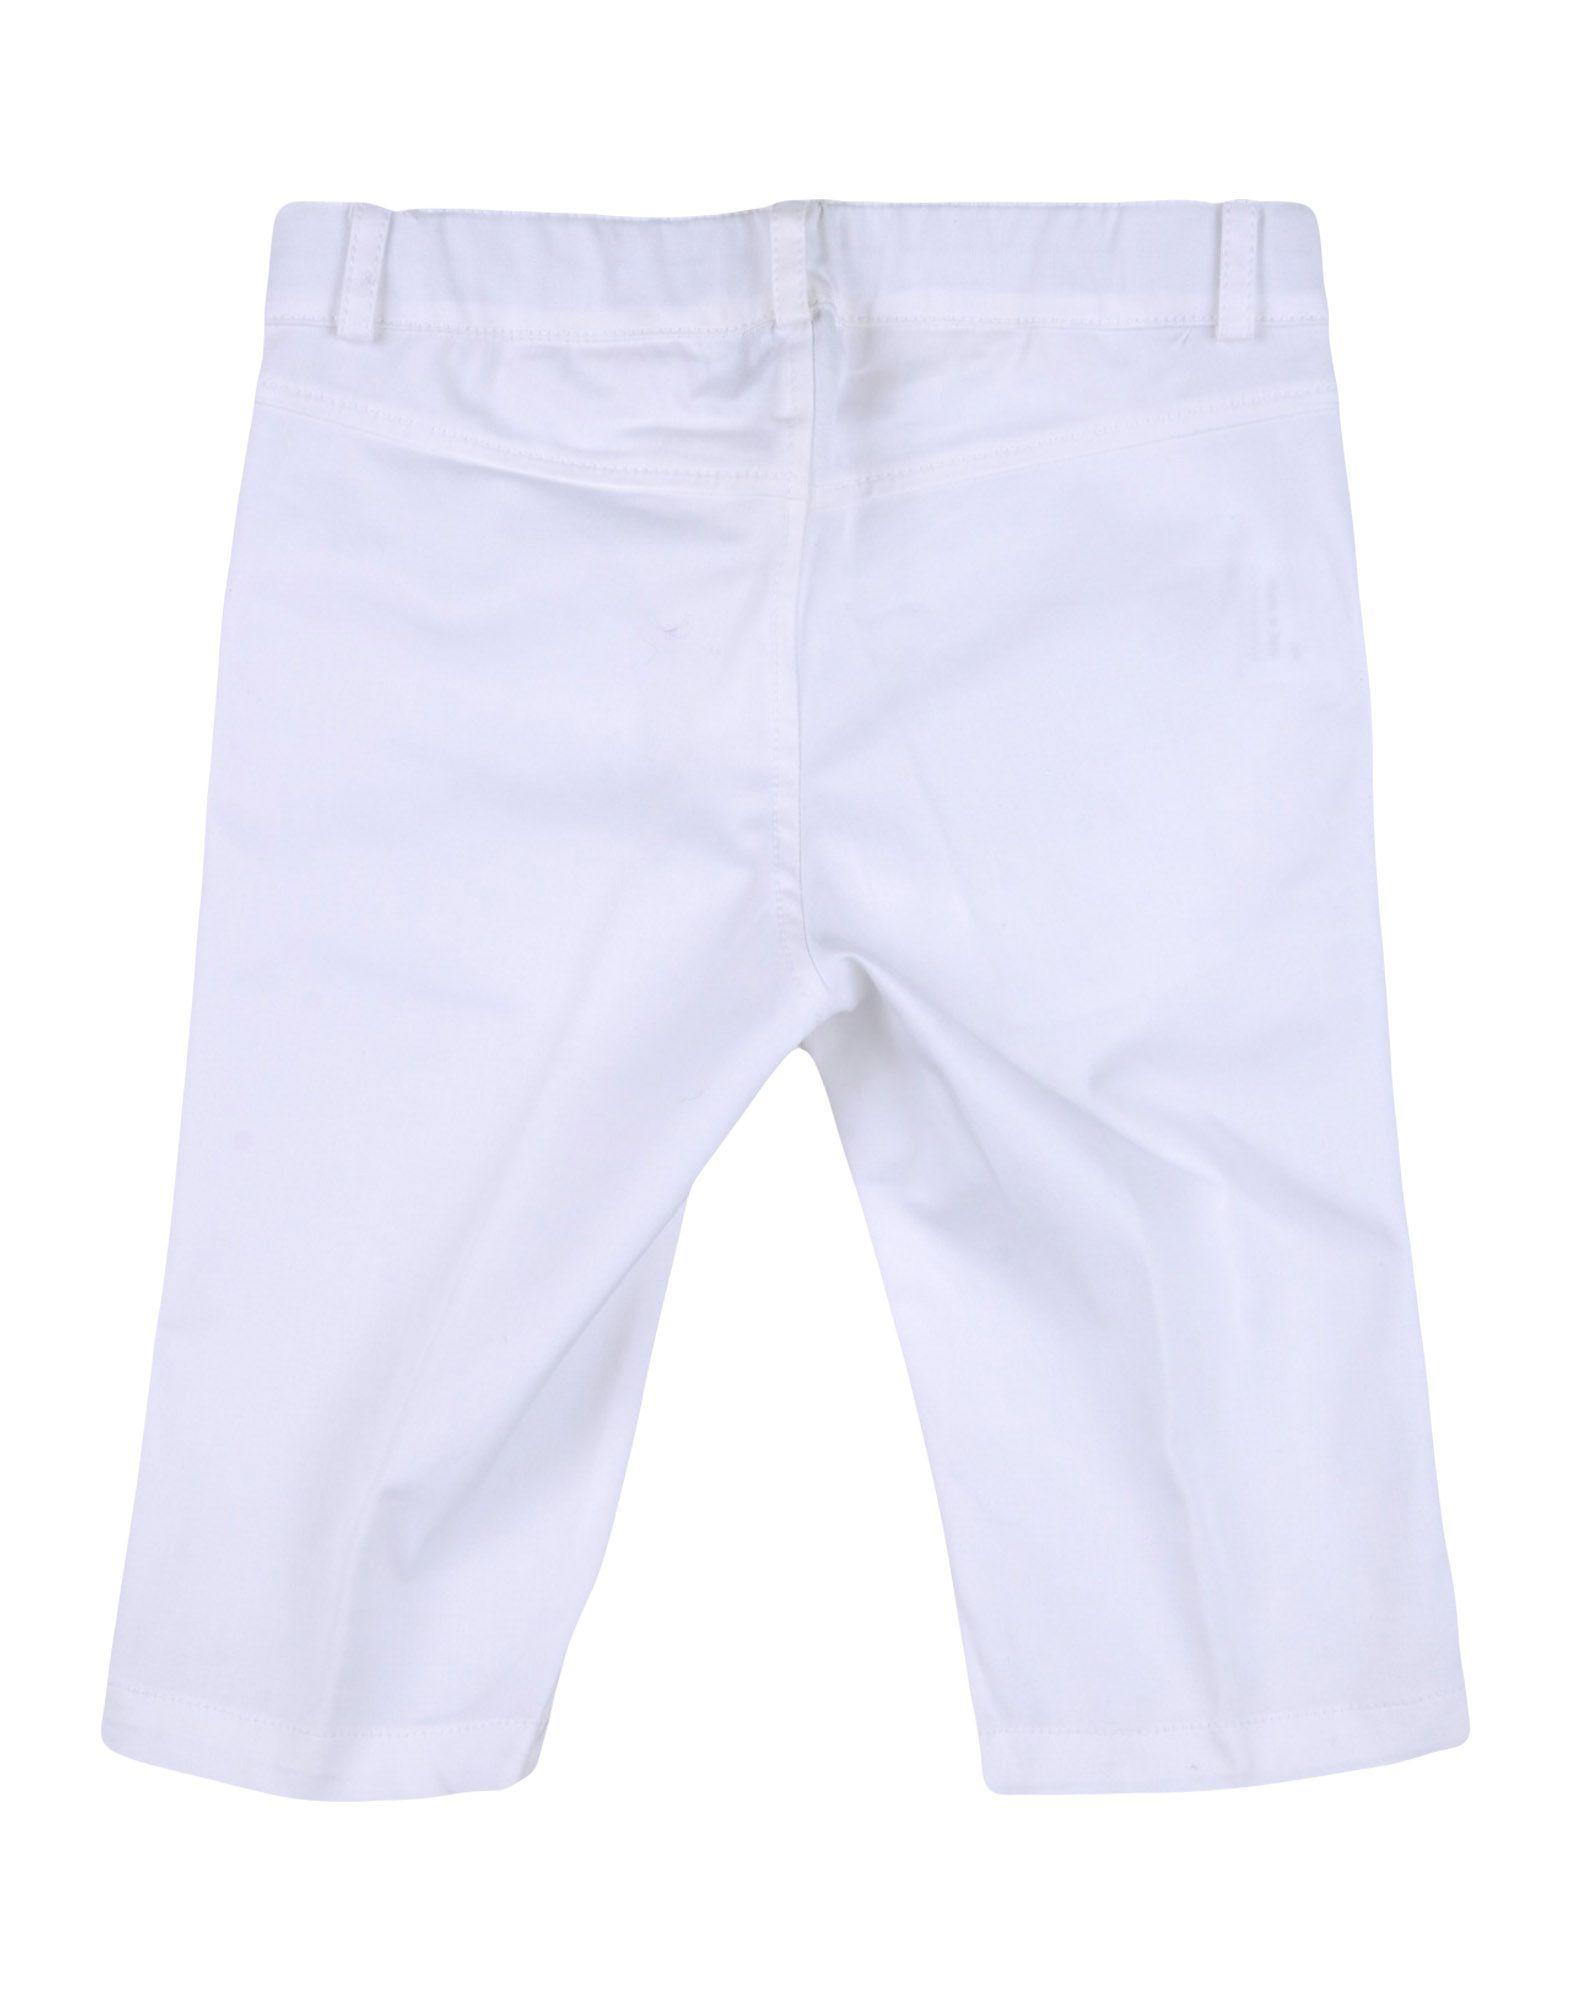 TROUSERS Aletta White Boy Cotton